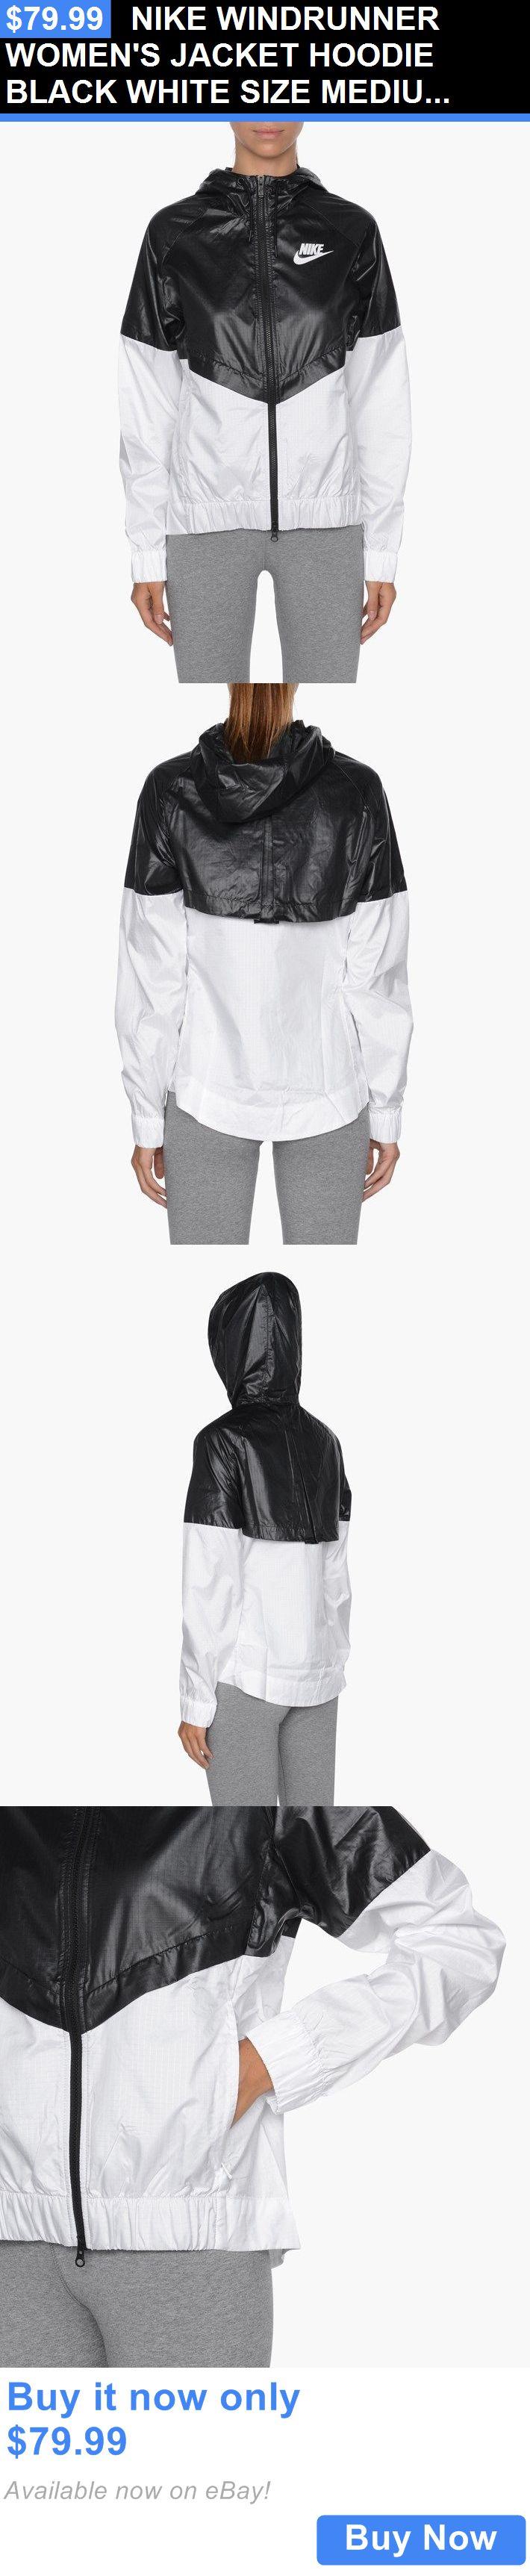 Women Athletics: Nike Windrunner Womens Jacket Hoodie Black White Size Medium 804947 010 BUY IT NOW ONLY: $79.99